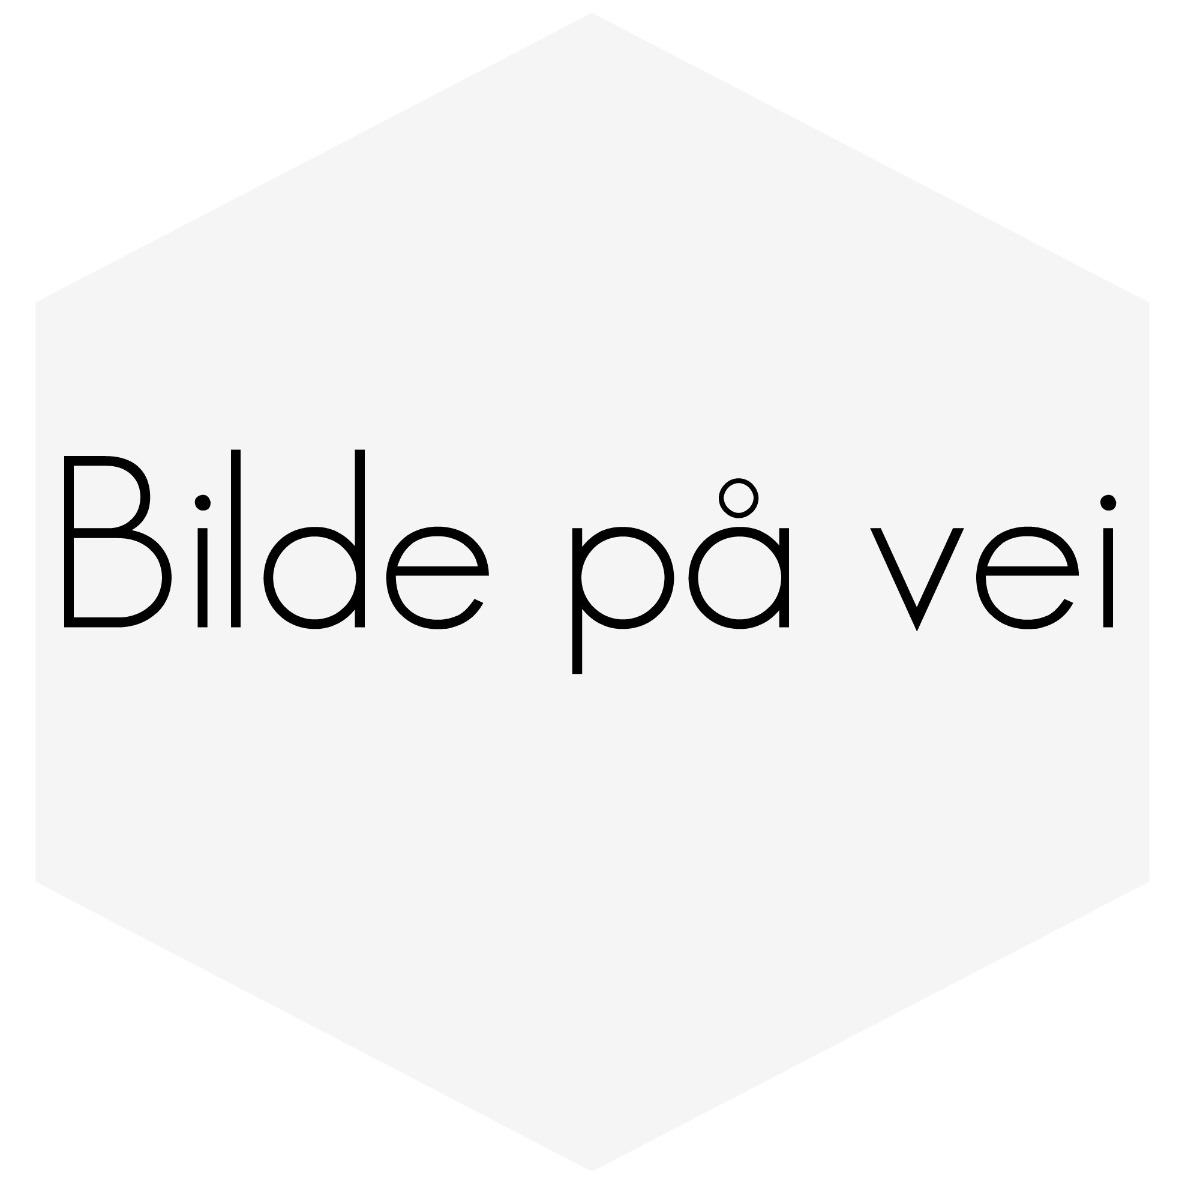 "SILIKONSLANGE SVART FLEKSIBEL 0,75"" (19MM)"